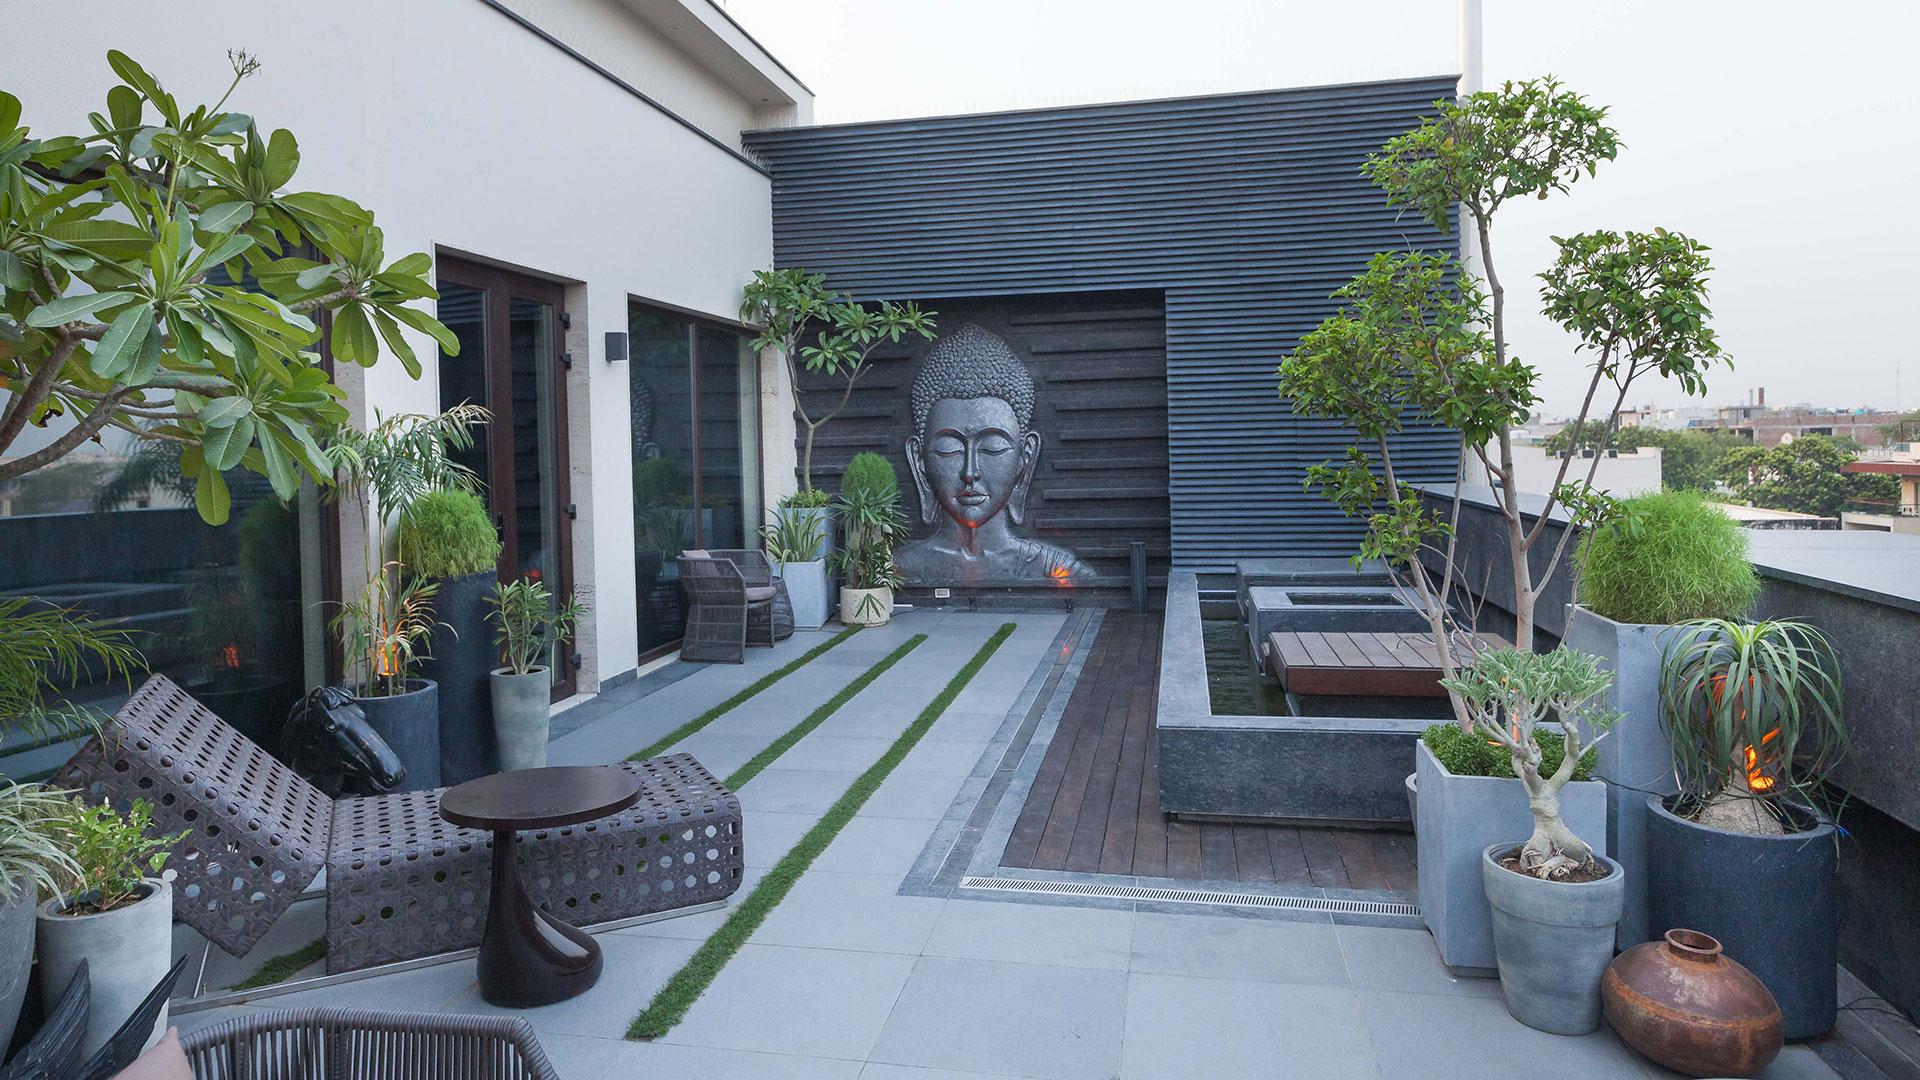 Home Garden Design Statues  Sculpture for Outdoor